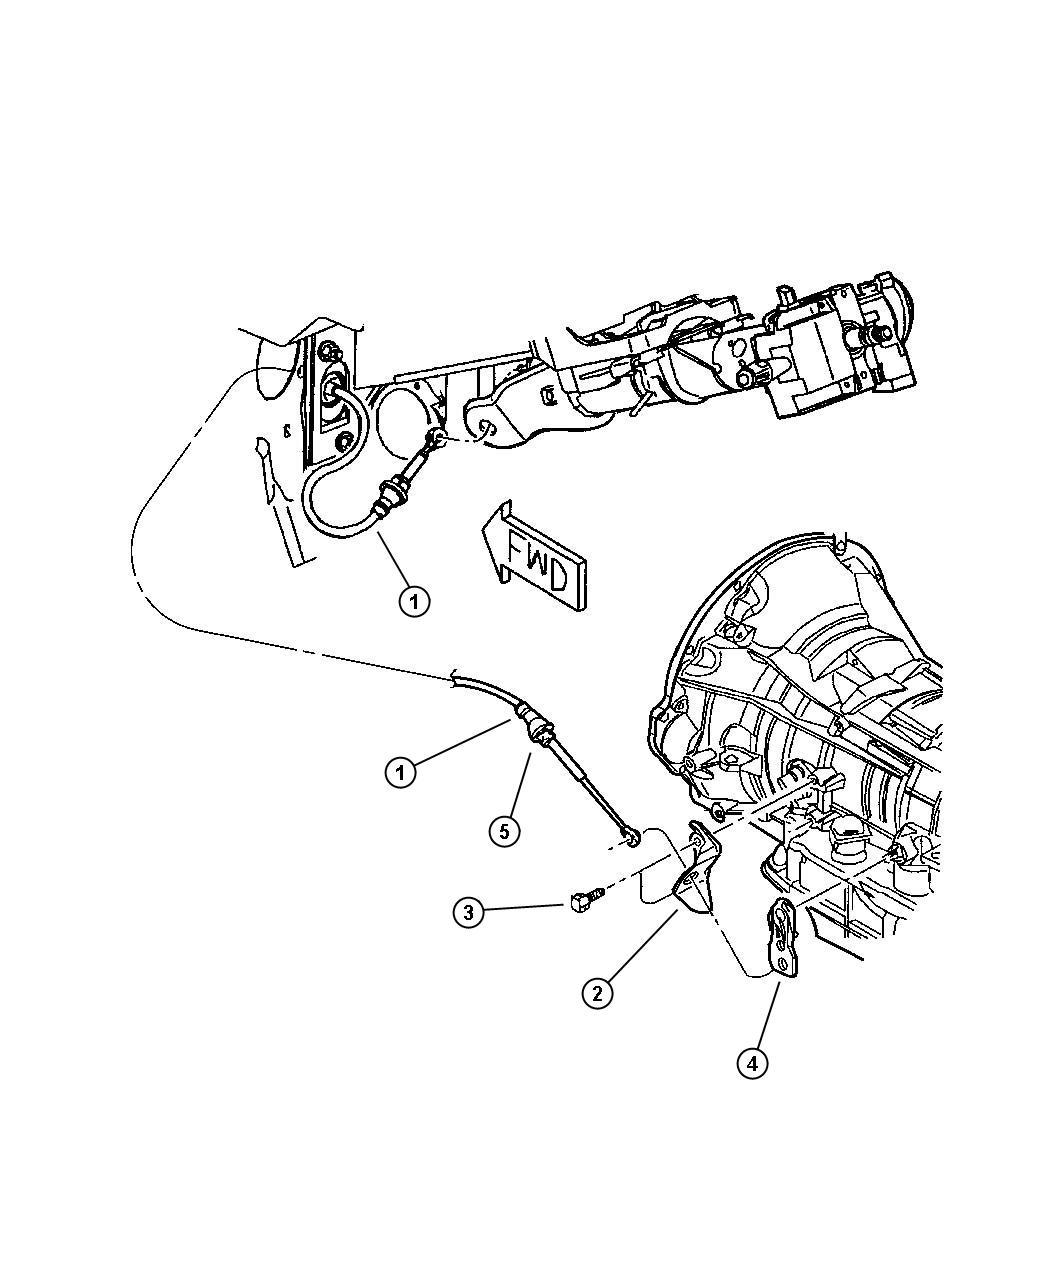 Dodge Dakota 4 7l V8 Mpi Multi Speed Auto 45rfe Gearshift Controls 45rfe Dg4